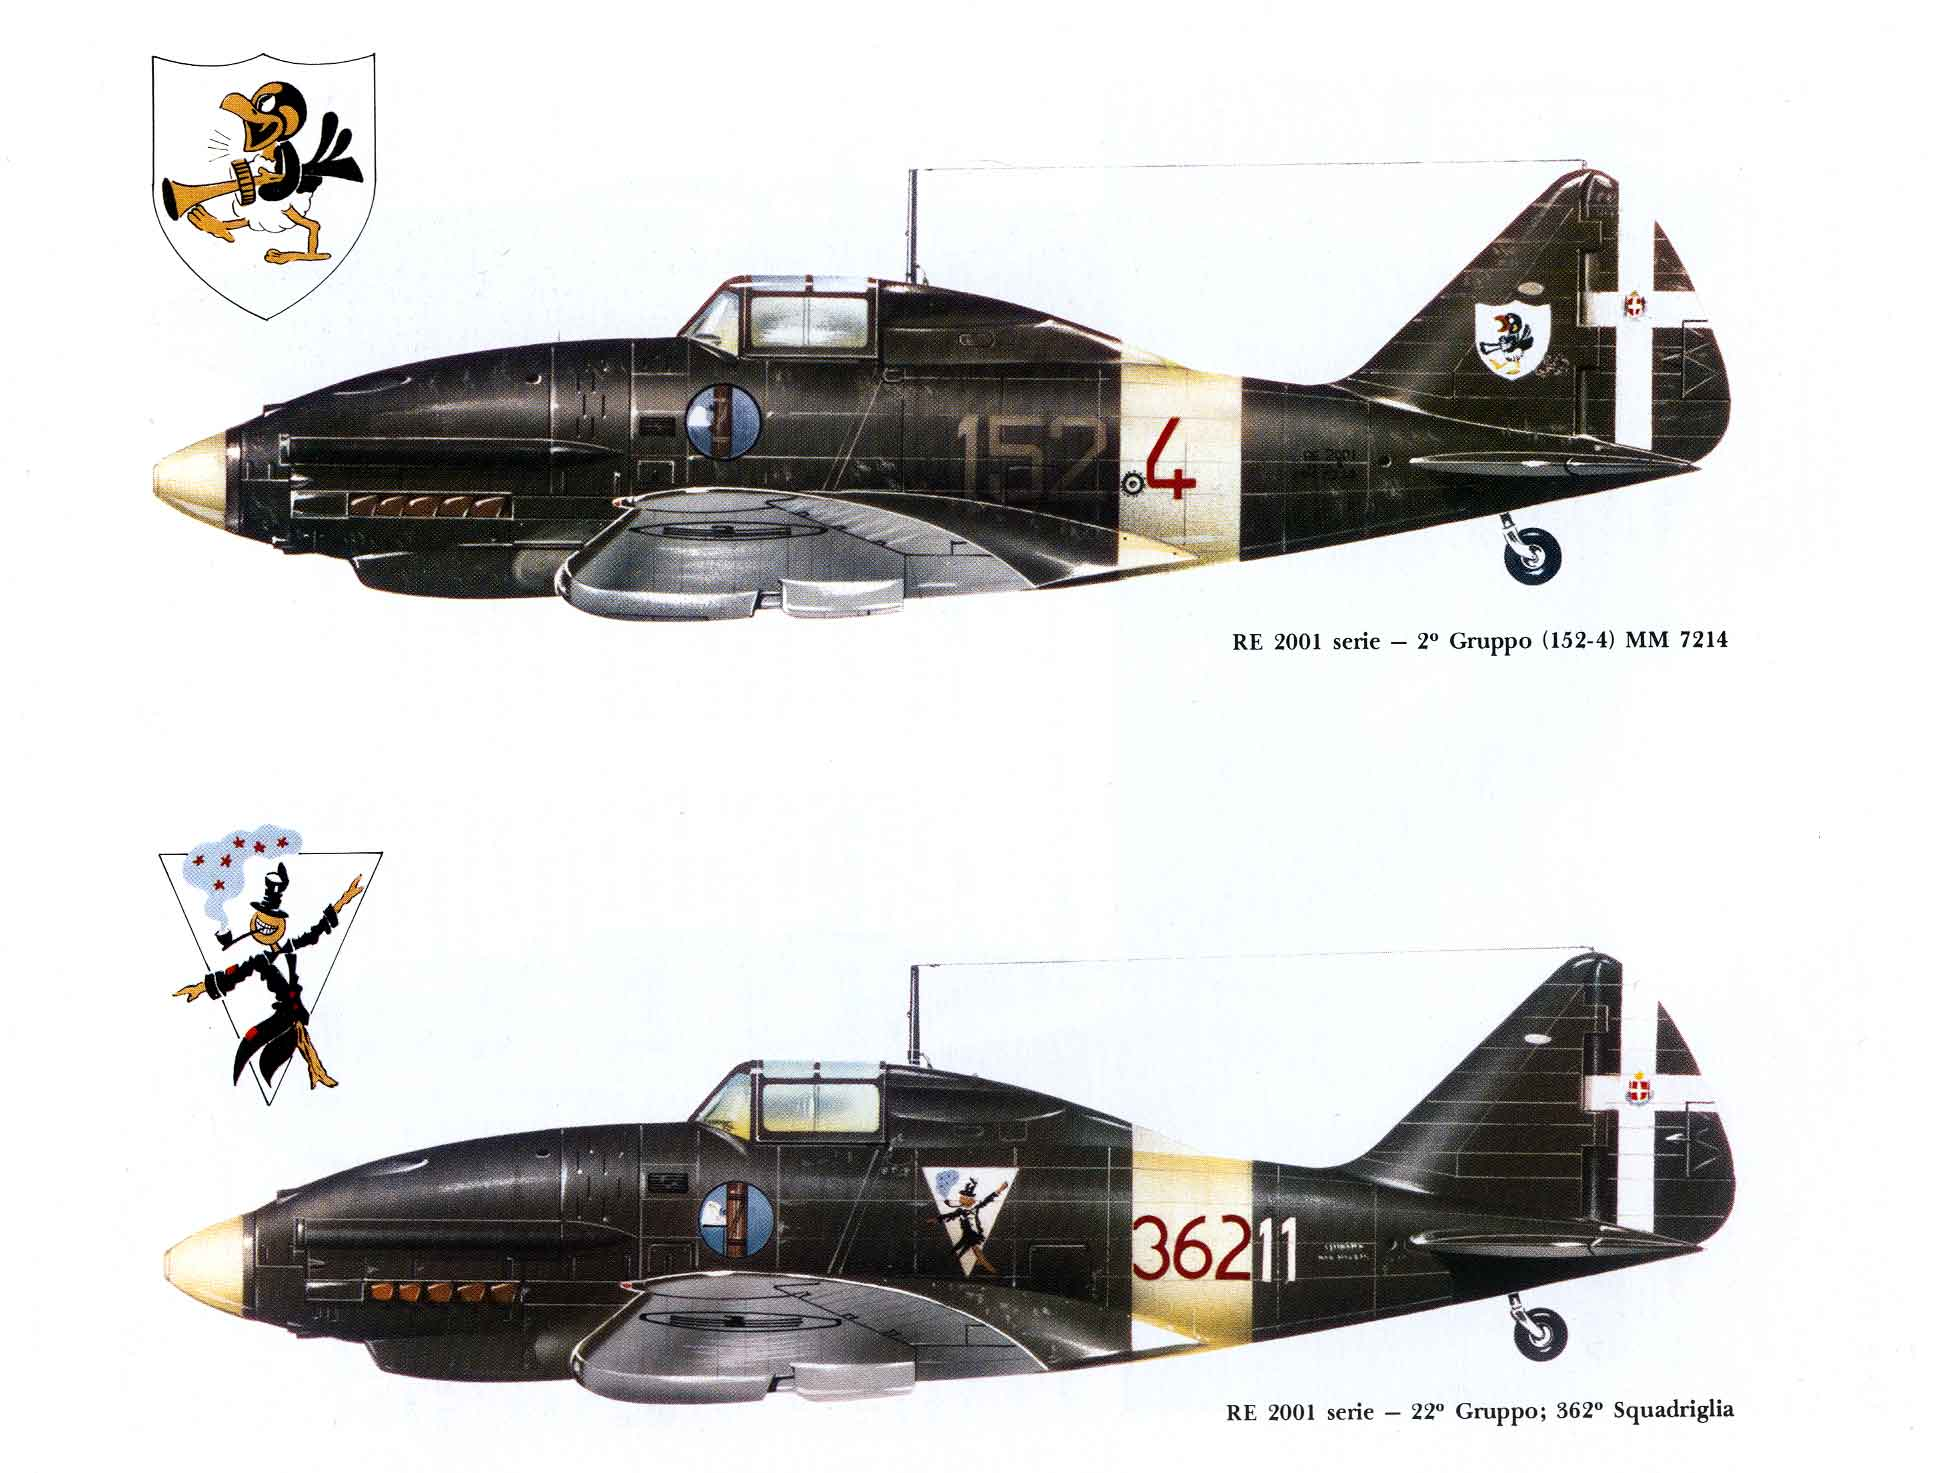 L'aviazione imbarcata italiana 1940-1943  – parte IV – di Gianluca Bertozzi